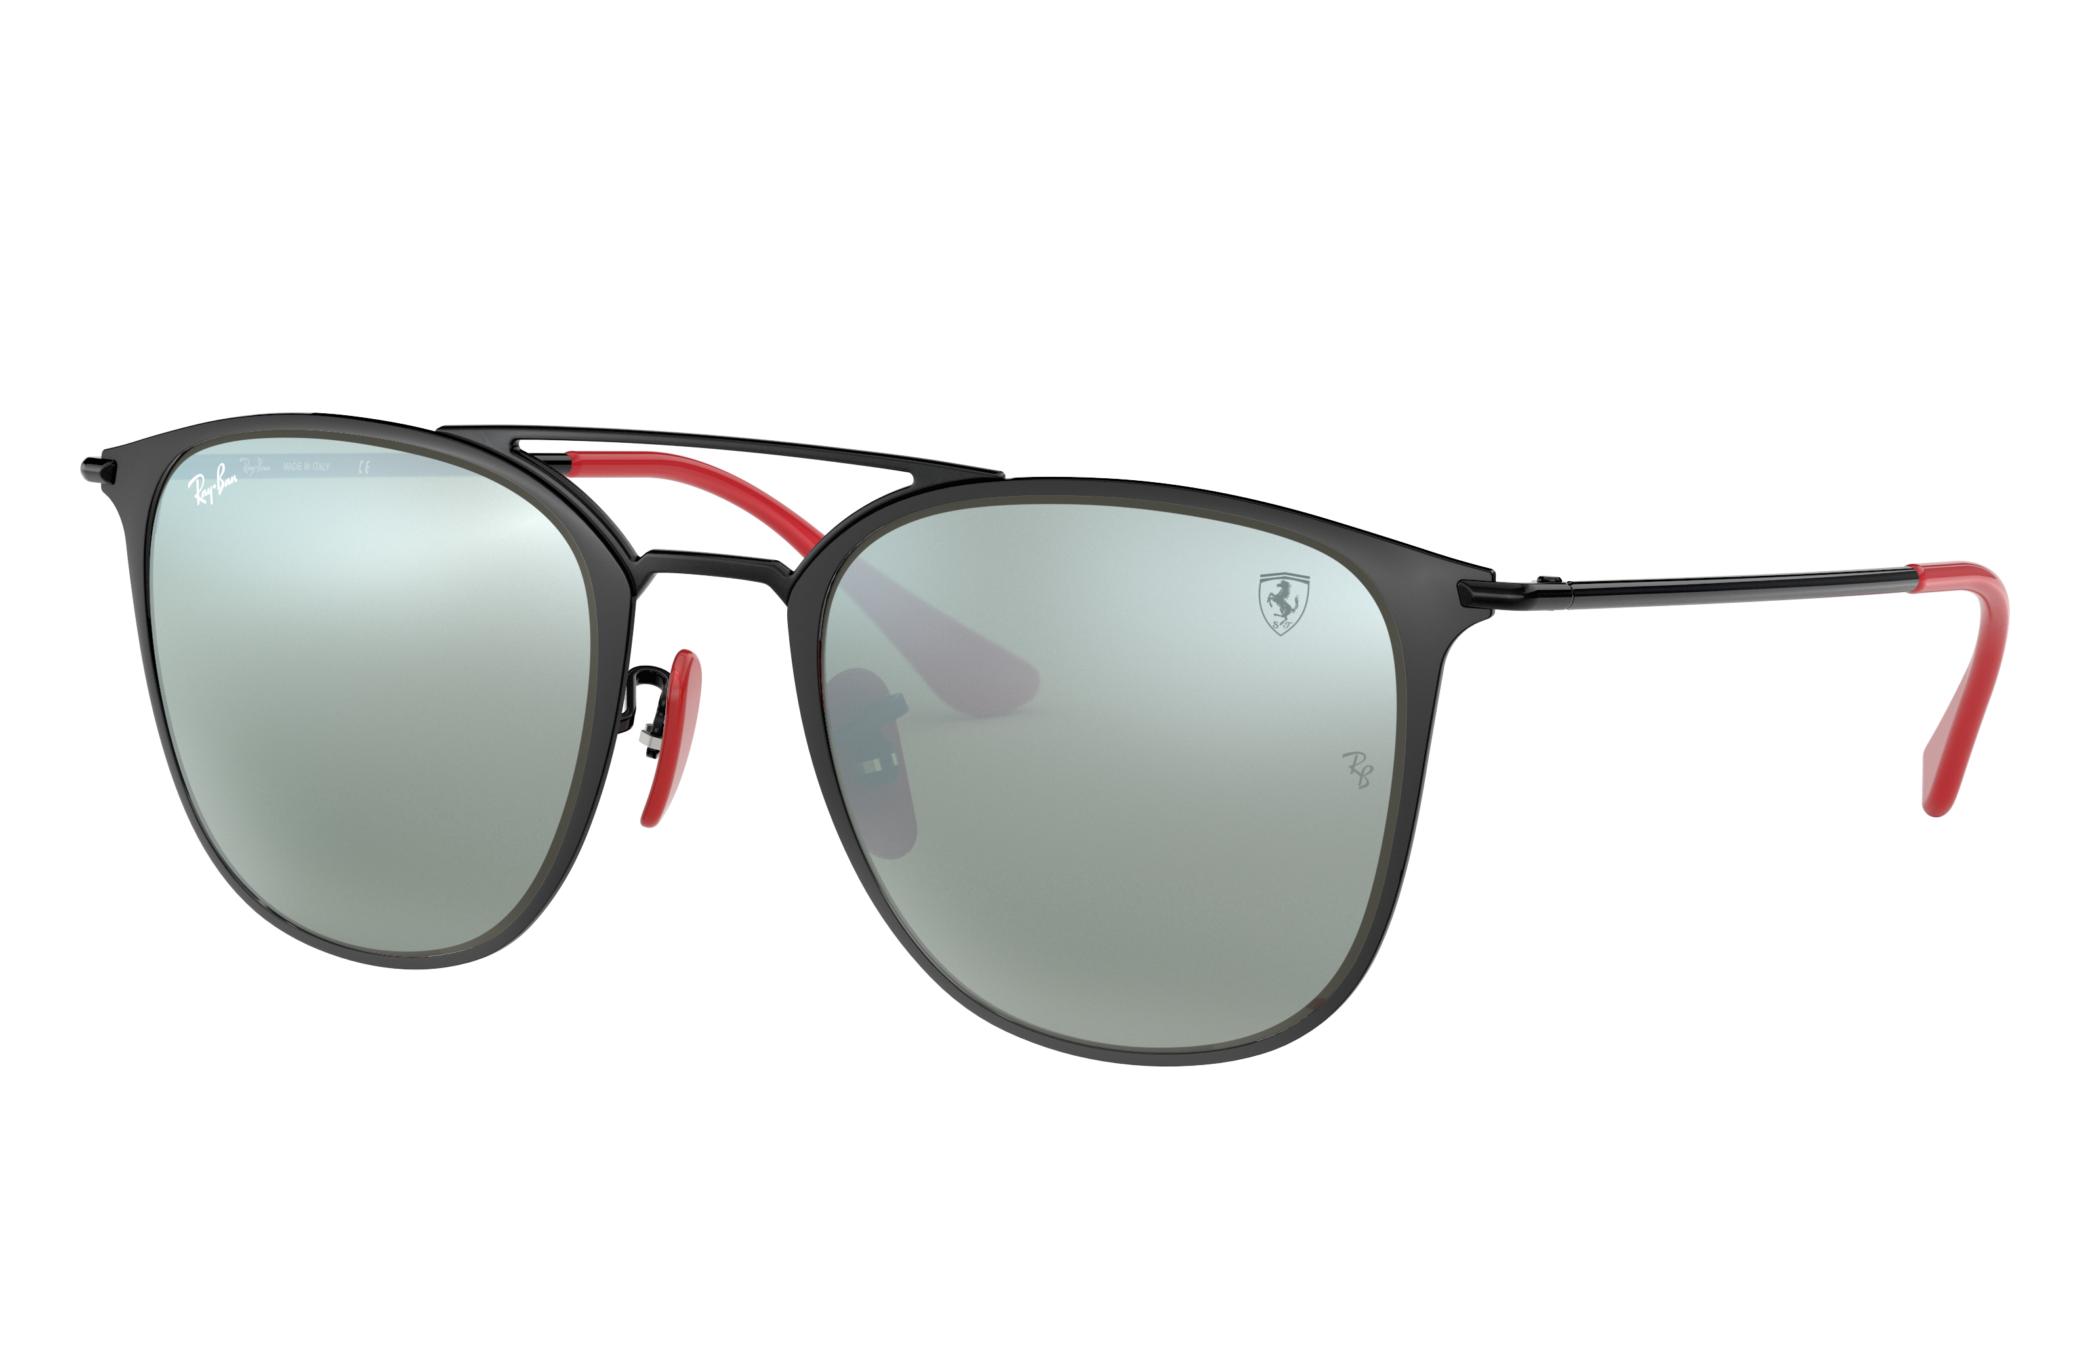 Ray-Ban Scuderia Ferrari Collection Rb3601m Black, Gray Lenses - RB3601M